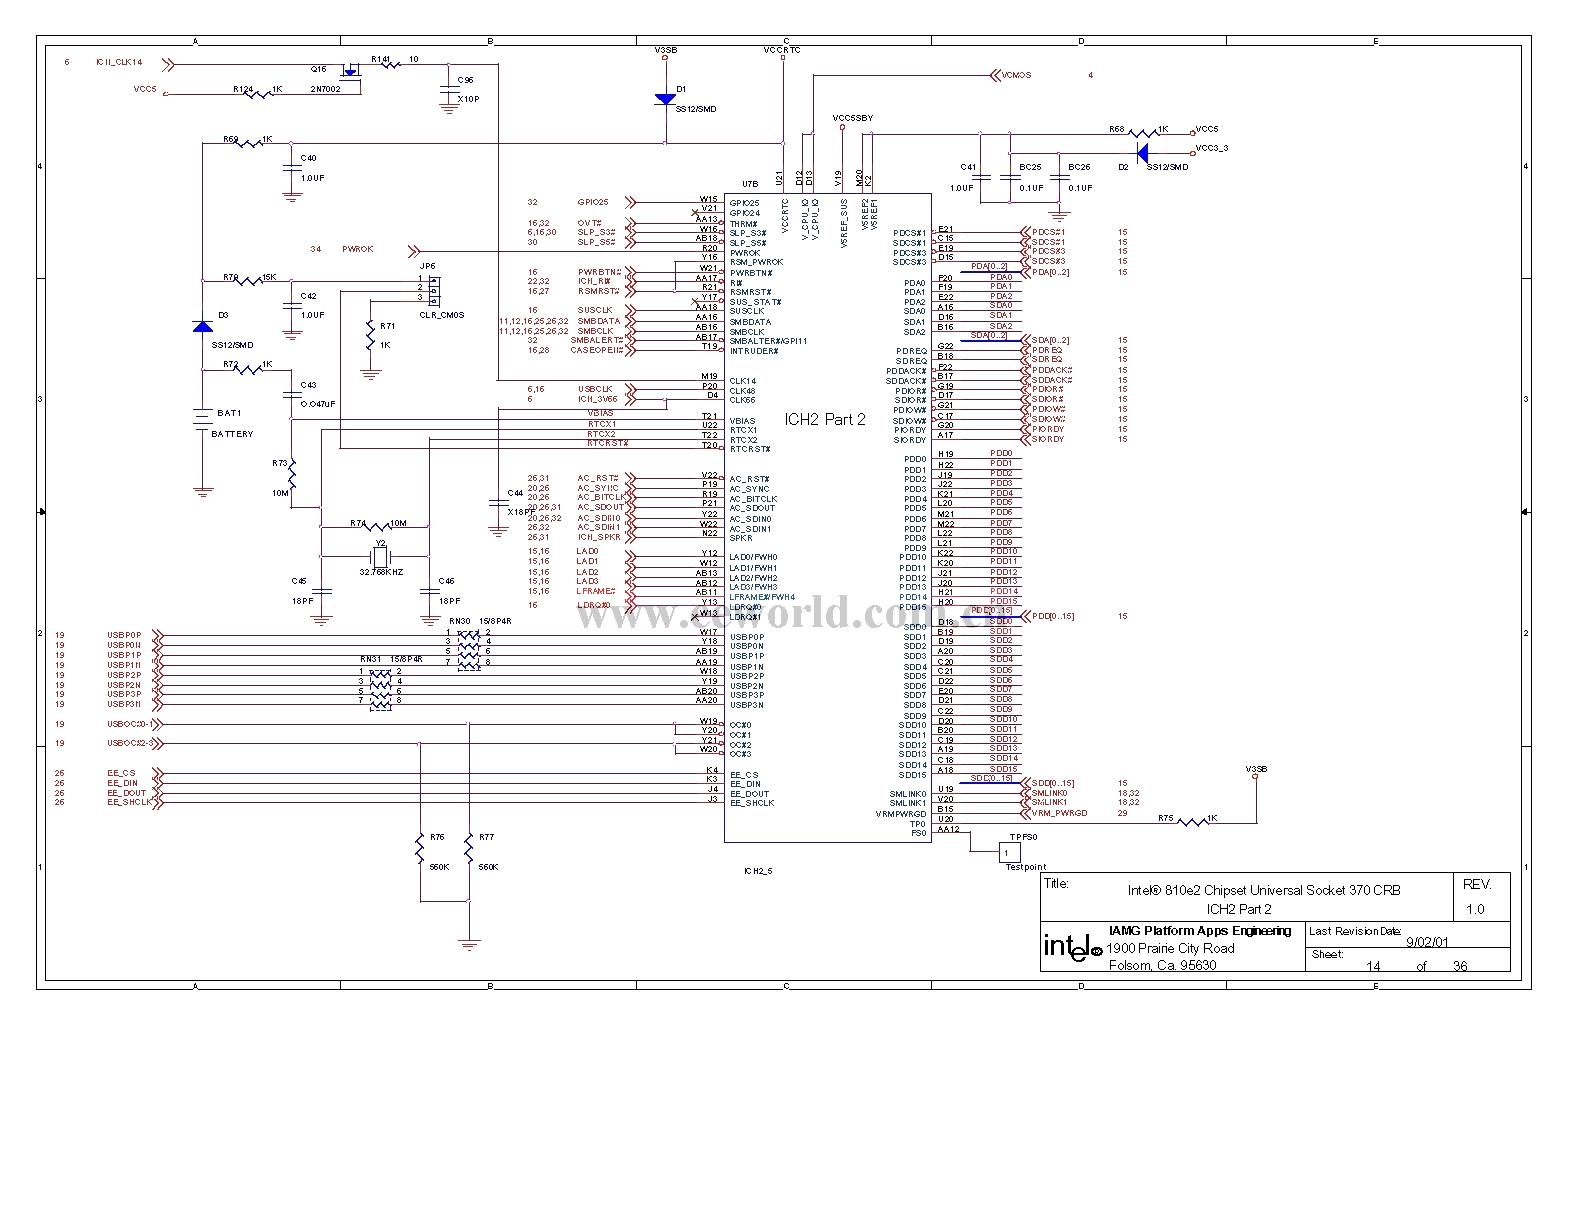 810 computer motherboard circuit diagram 14 - computer-related circuit